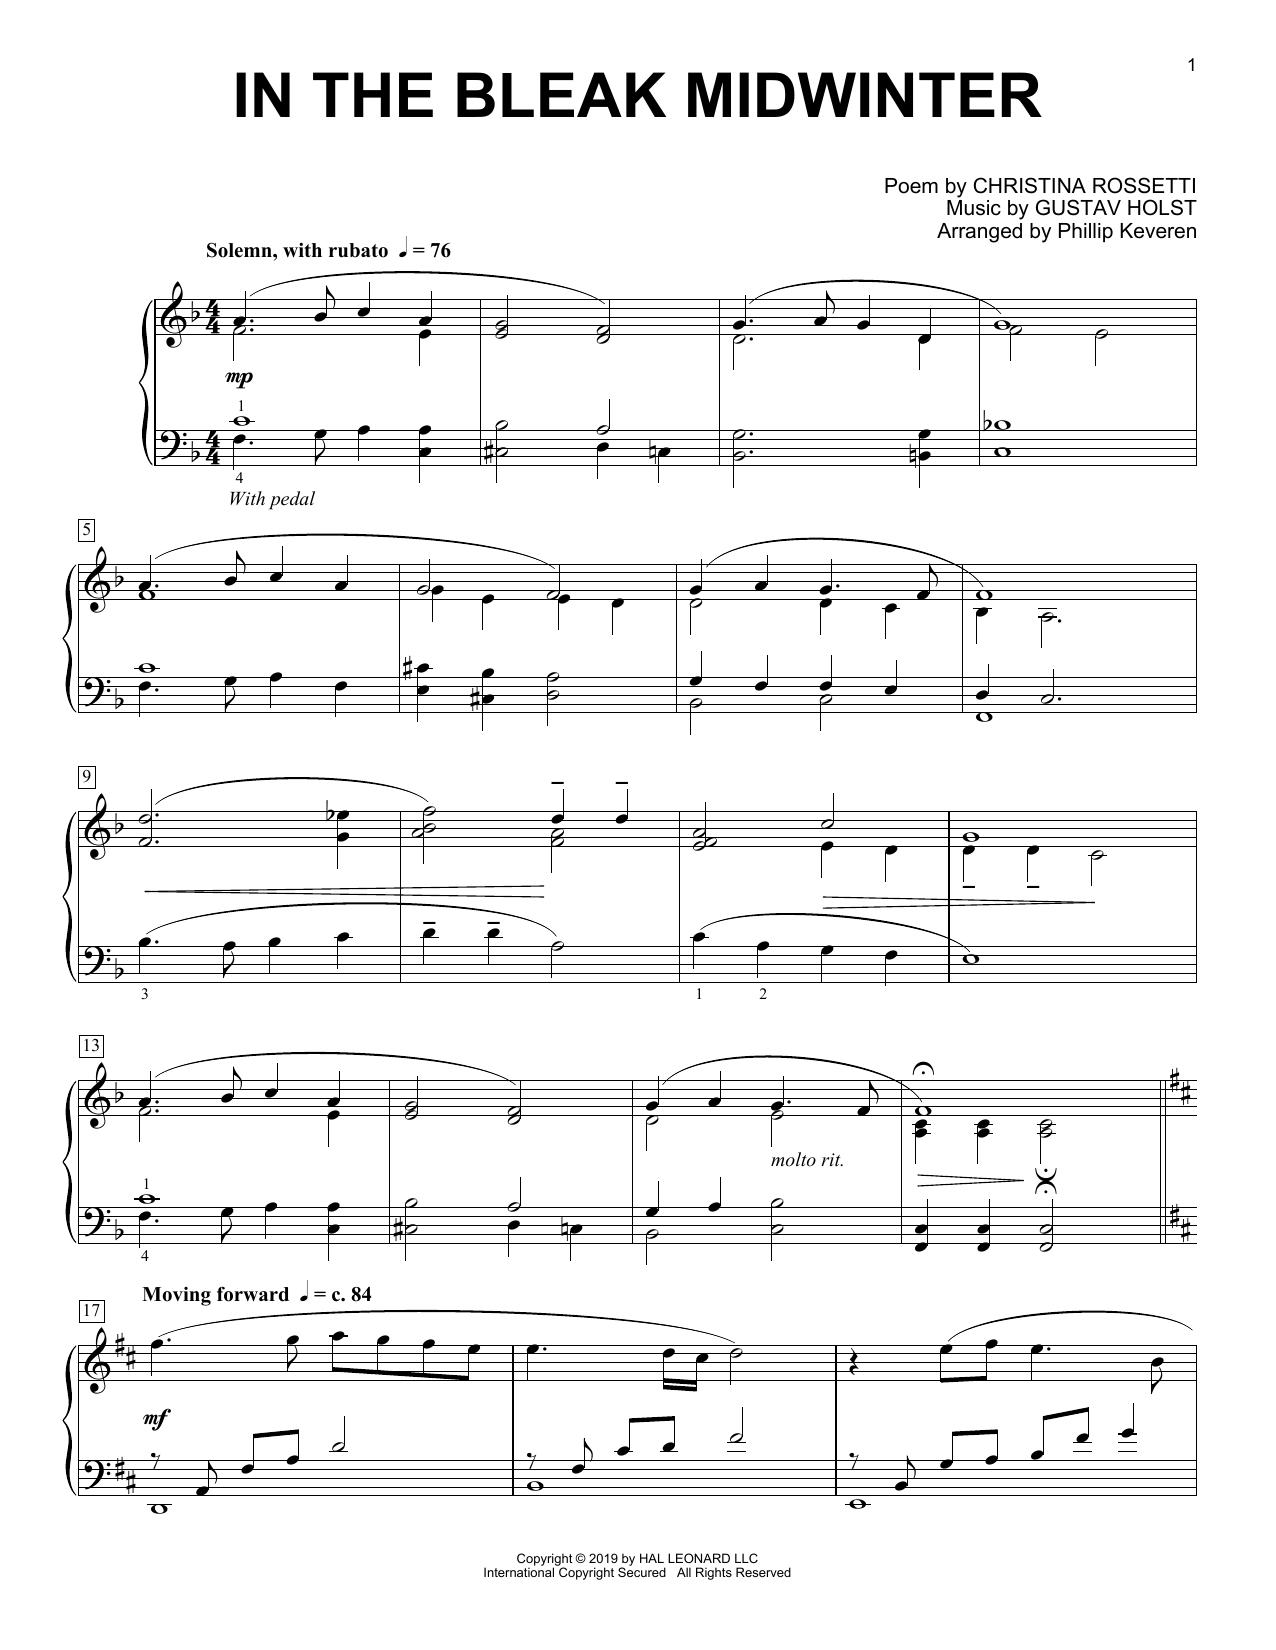 Gustav Holst In The Bleak Midwinter [Classical version] (arr. Phillip Keveren) sheet music notes and chords